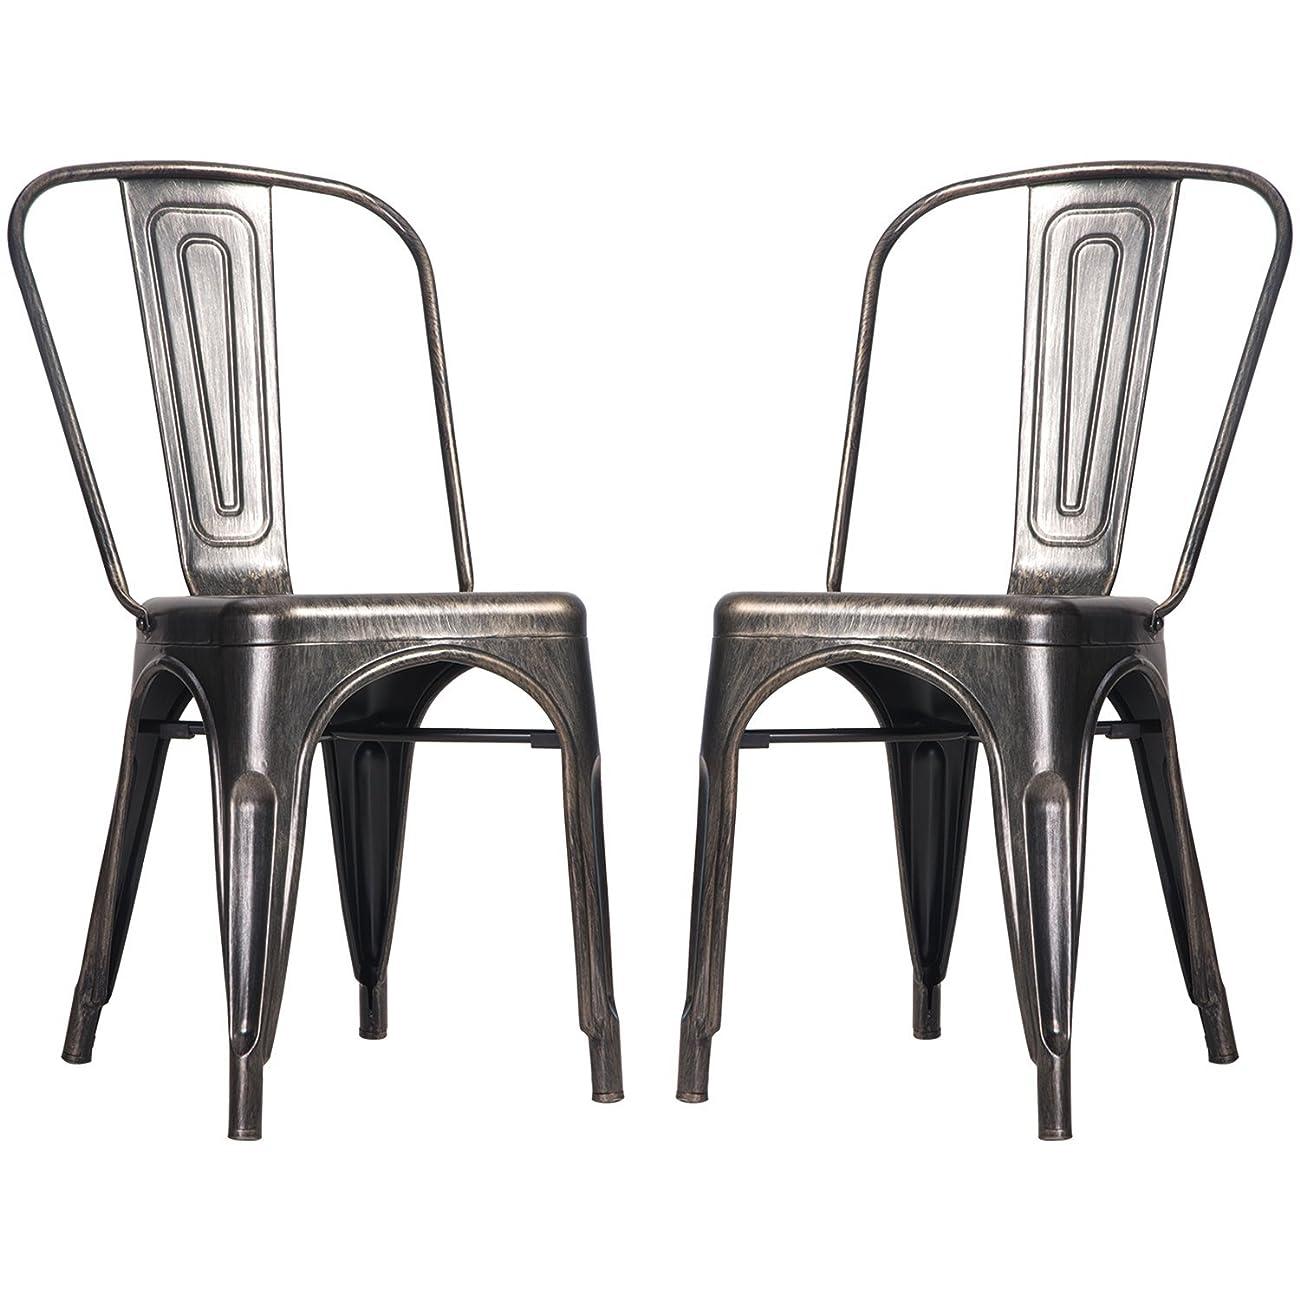 high back metal dining chairs trendy chair merax steel stackable vintage